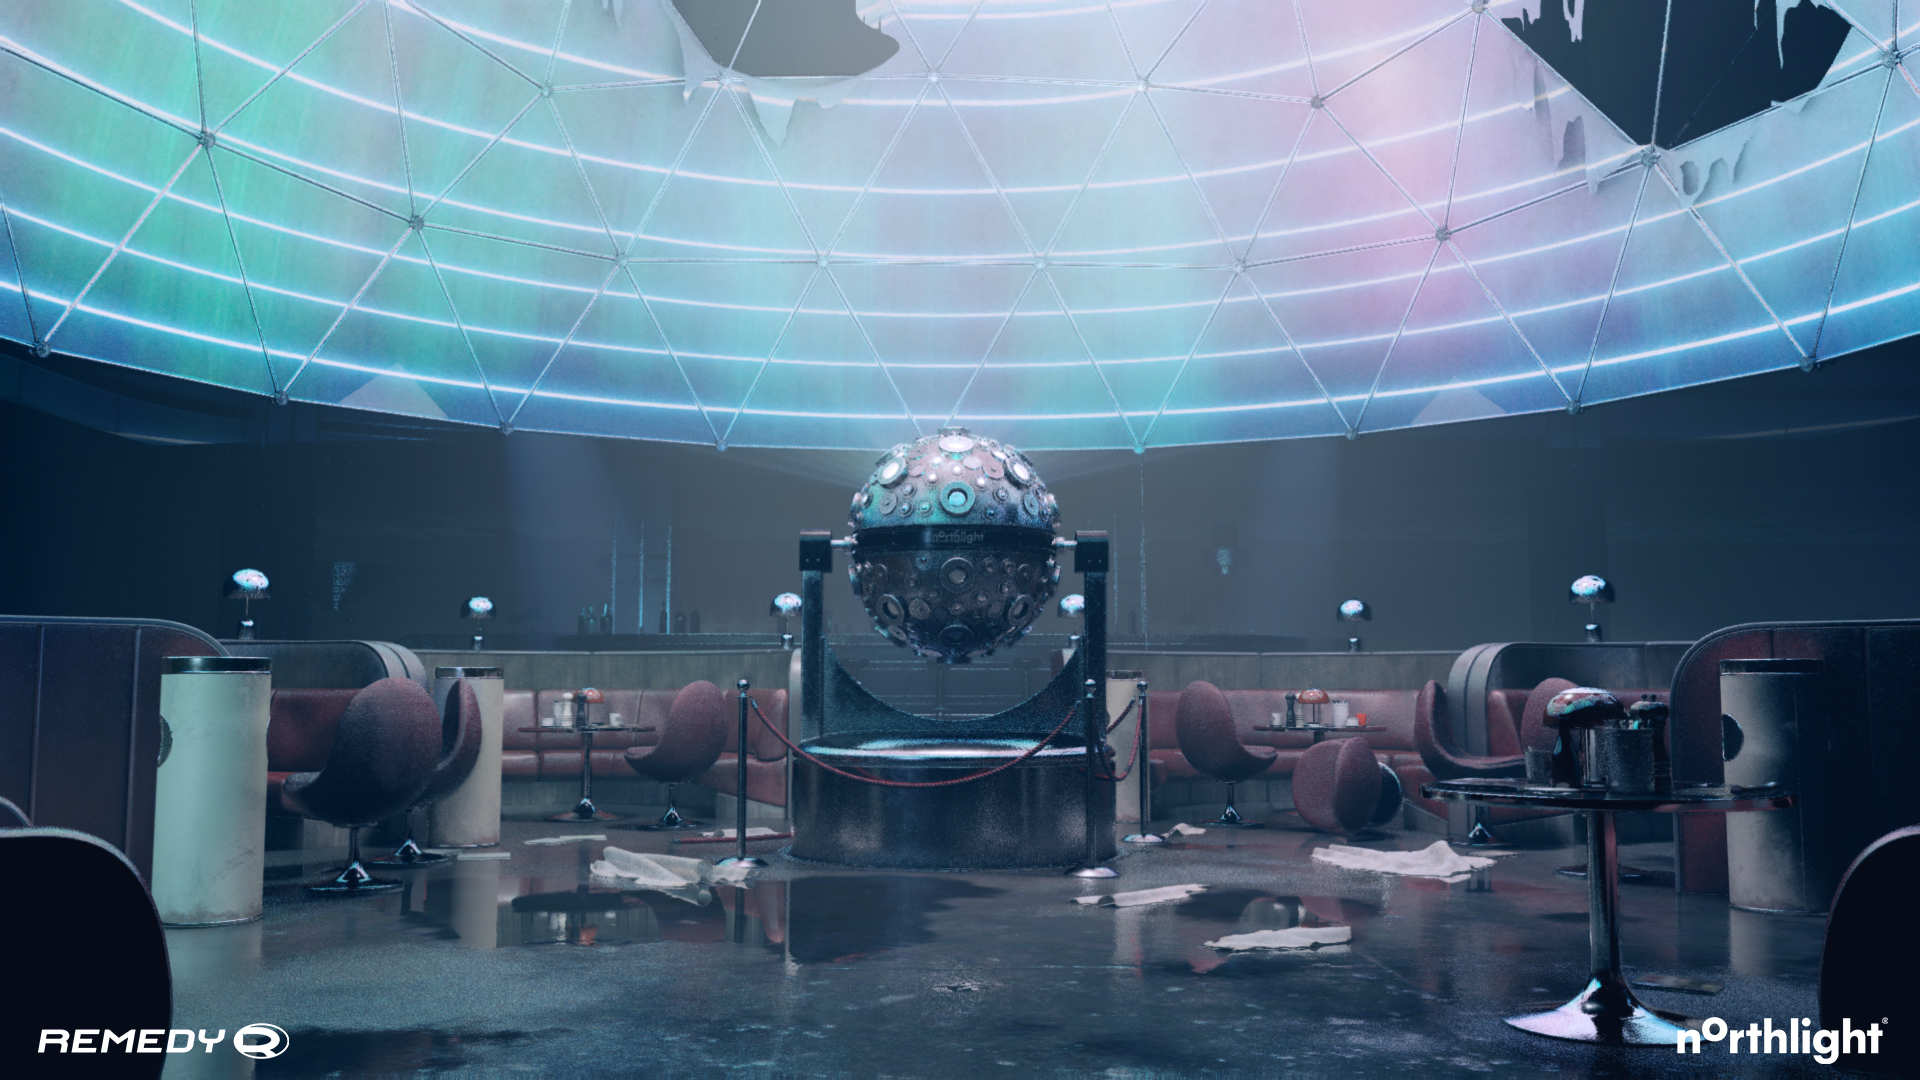 https://xgm.guru/p/gamedev/realtime-ray-tracing